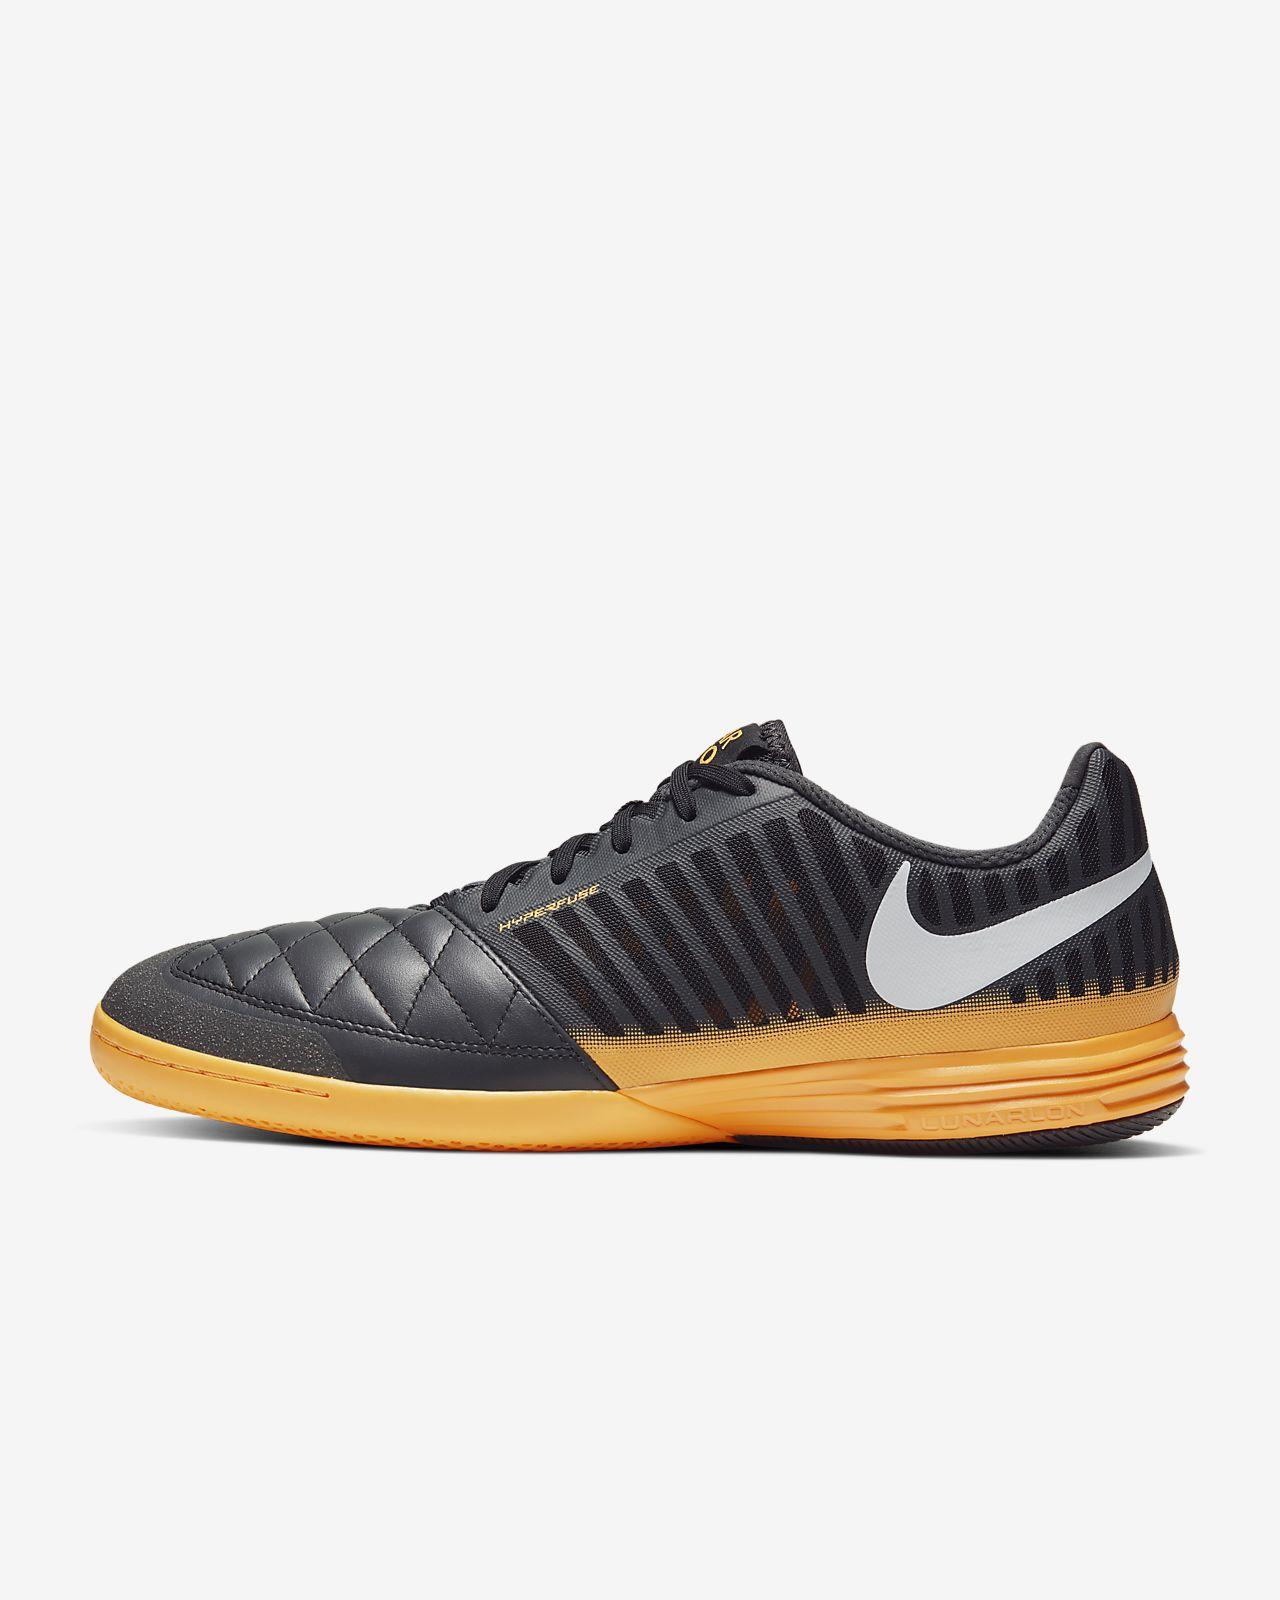 Fotbollssko för inomhusplan/futsal/street Nike Lunar Gato II IC